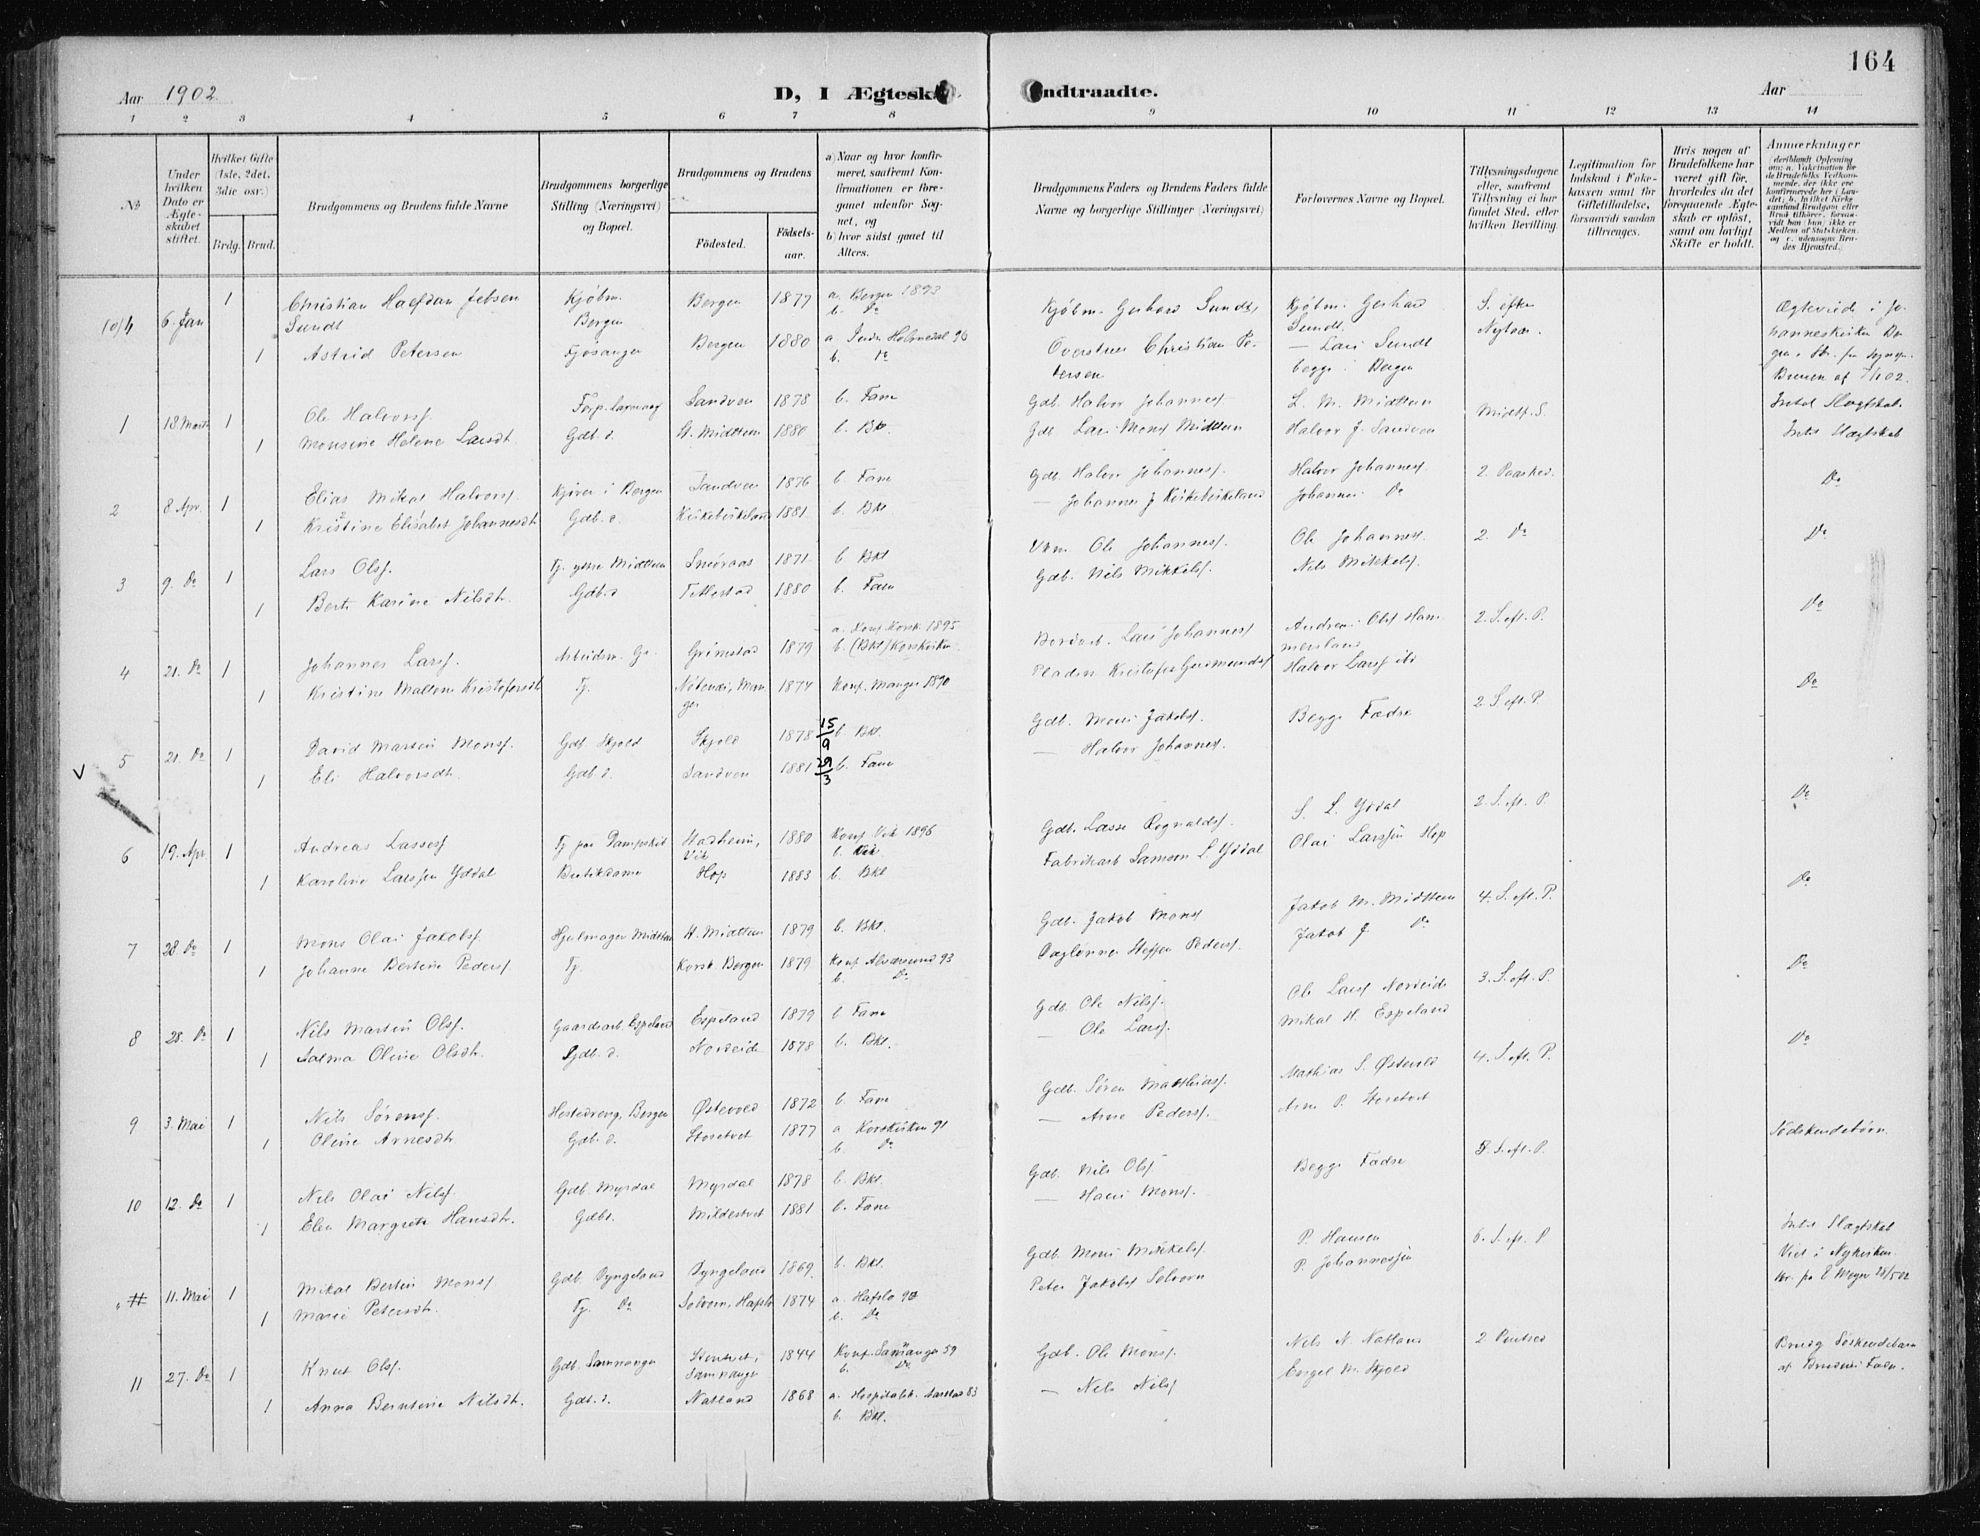 SAB, Fana Sokneprestembete, H/Haa/Haai/L0003: Ministerialbok nr. I 3, 1900-1912, s. 164